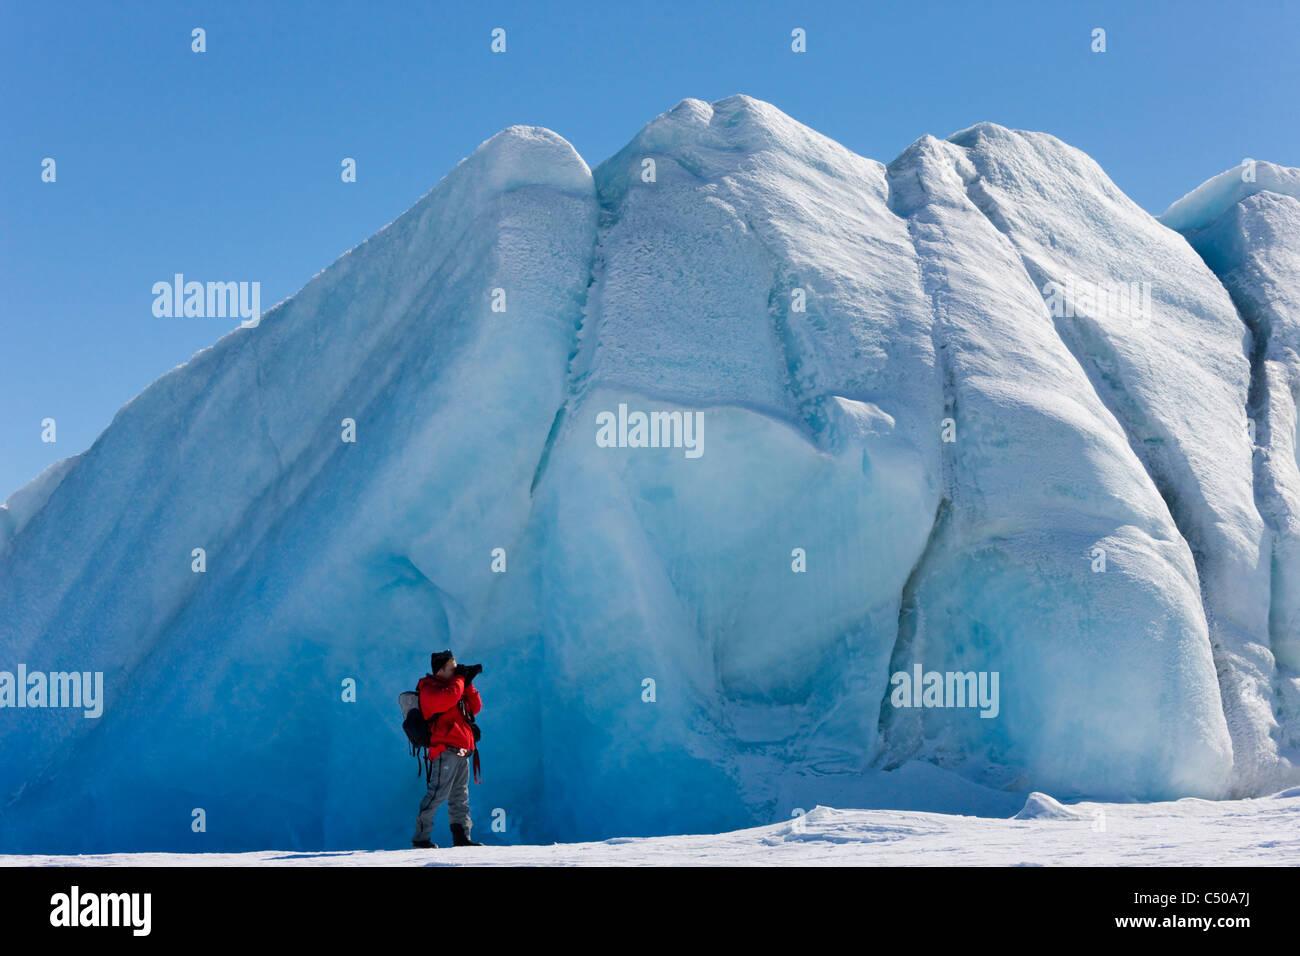 Touristen fotografieren Eisberg, Snow Hill Island, Antarktis Stockbild